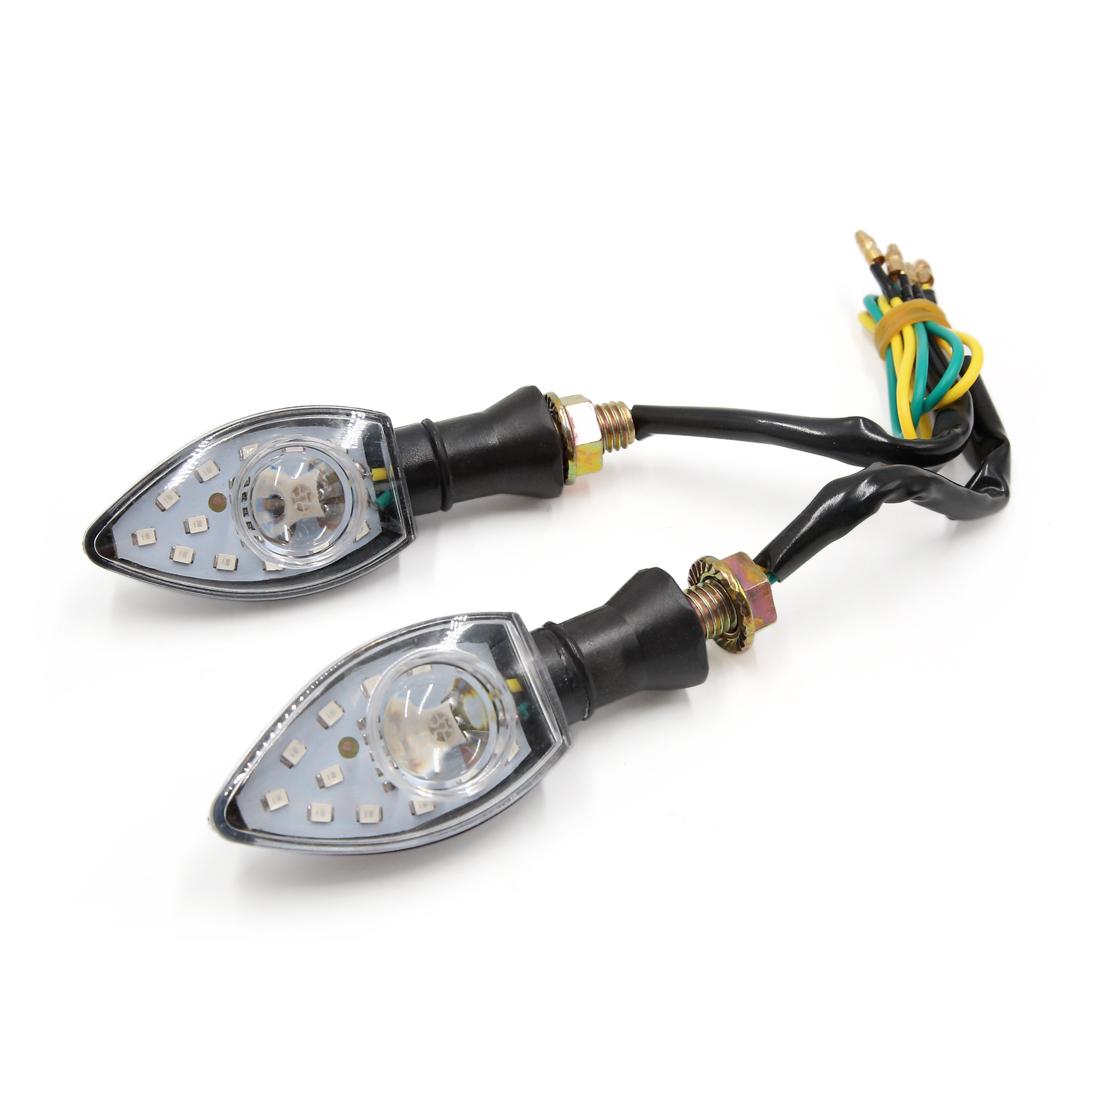 2Pcs Universal Motorcycle Green 13 LED Turn Signal Indicator Light Lamp